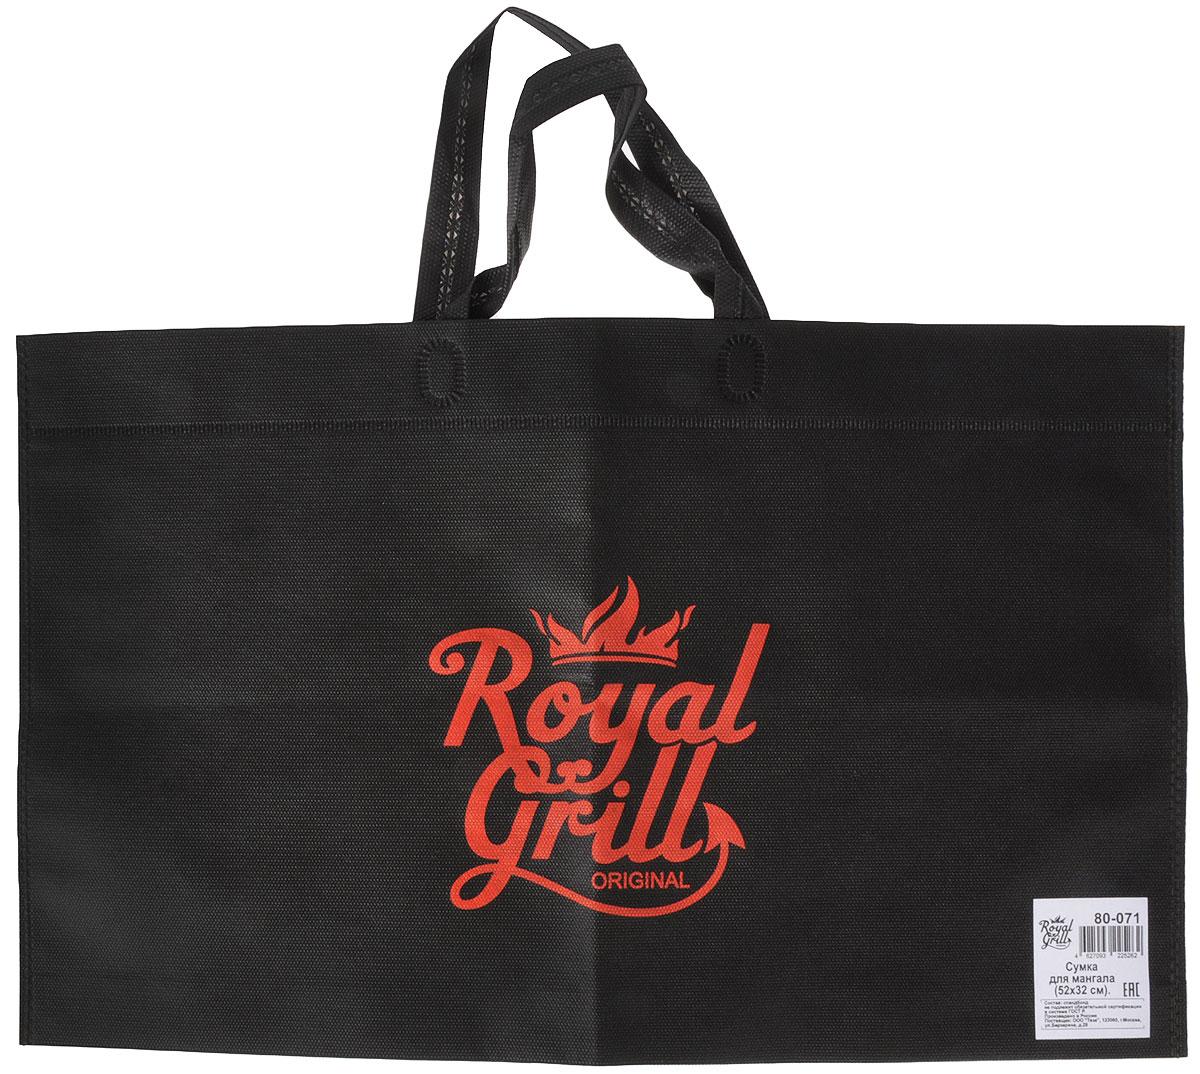 Сумка для мангала RoyalGrill, 52 х 32 см. 80-071 сумка для мангала royalgrill 52 х 32 см 80 071